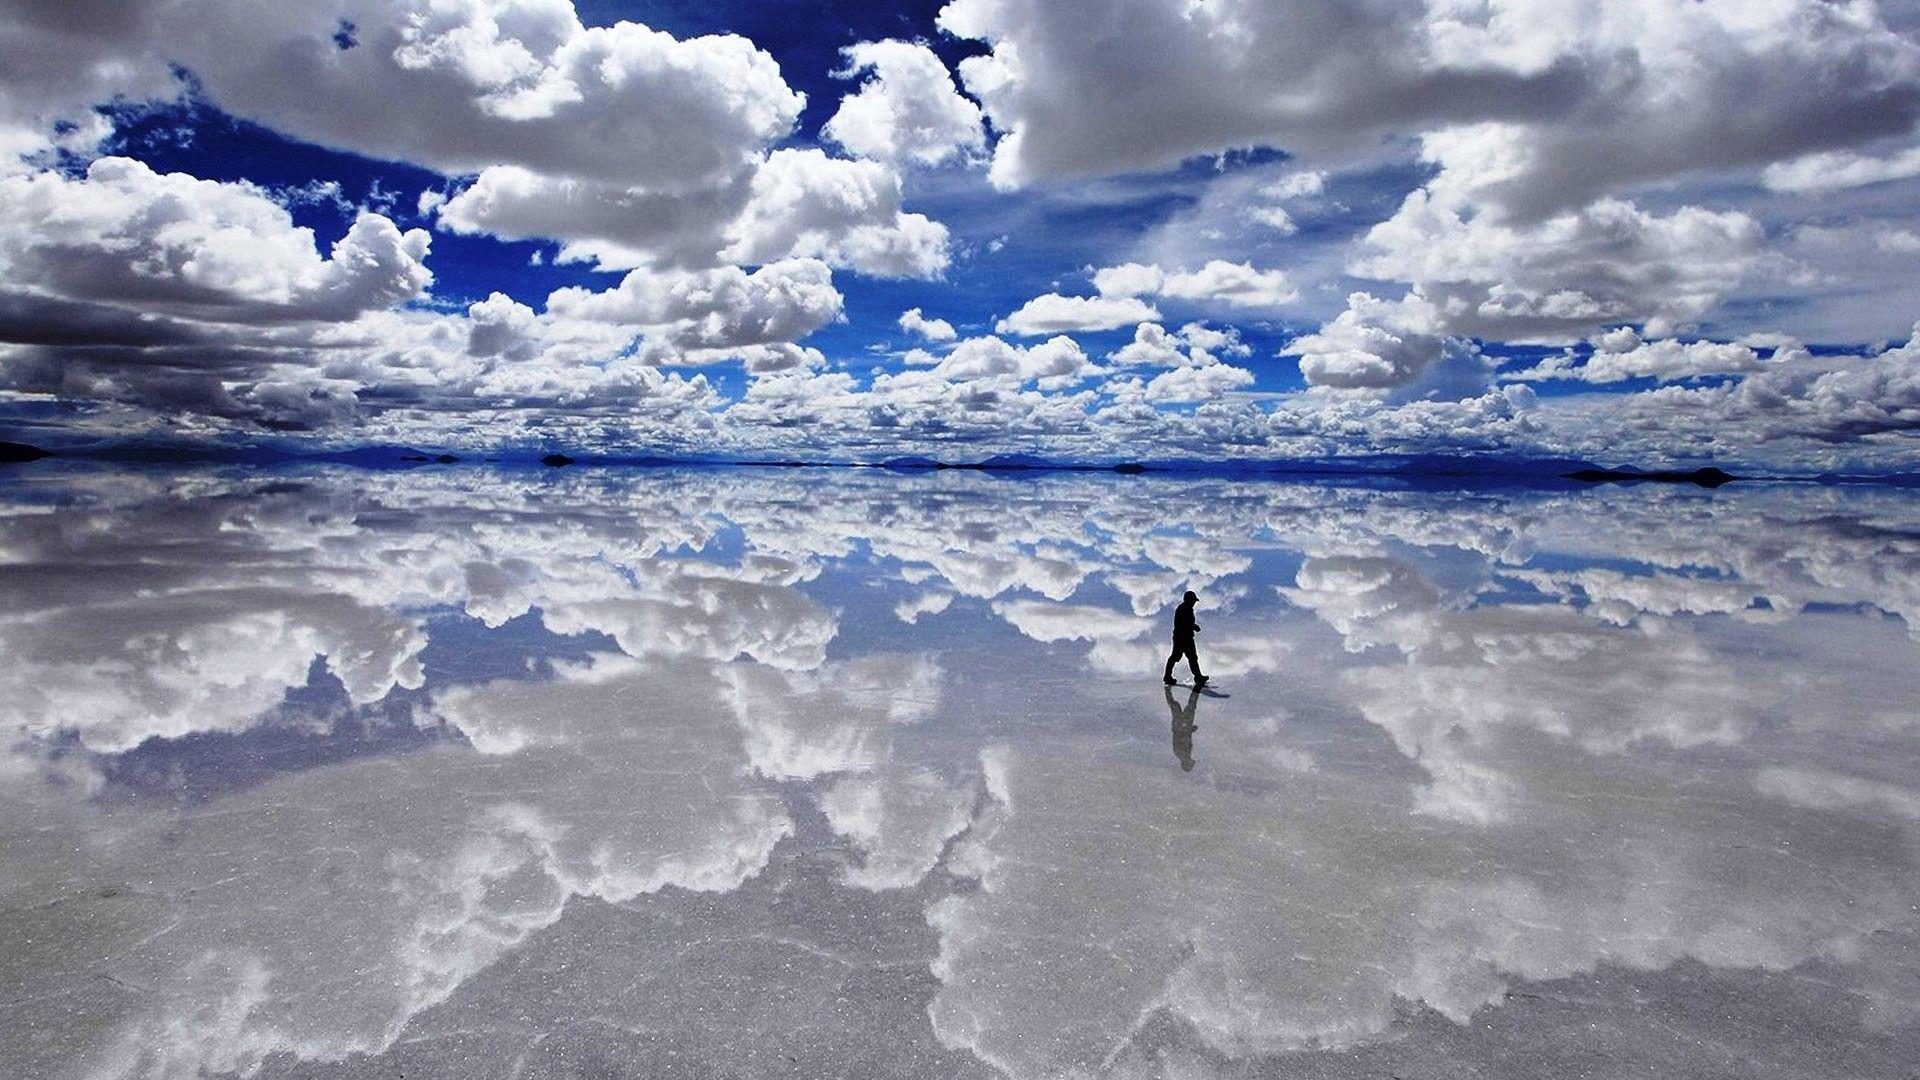 Salar De Uyuni Bolivia 1920X1080 wallpaper 1920x1080